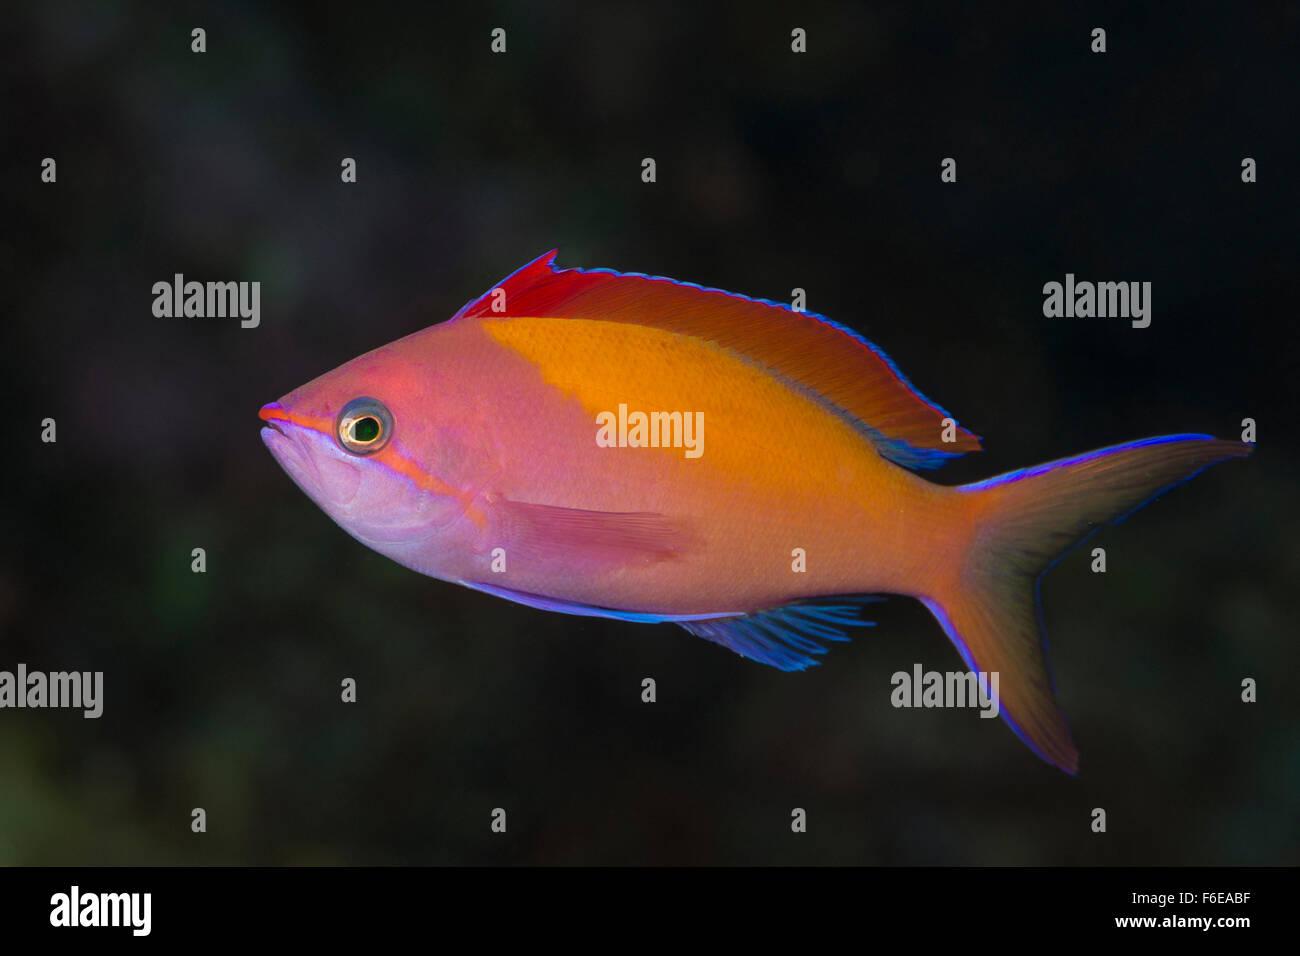 Redfin Fairy Basslet, Pseudanthias dispar, Flores, Indonesia Stock Photo